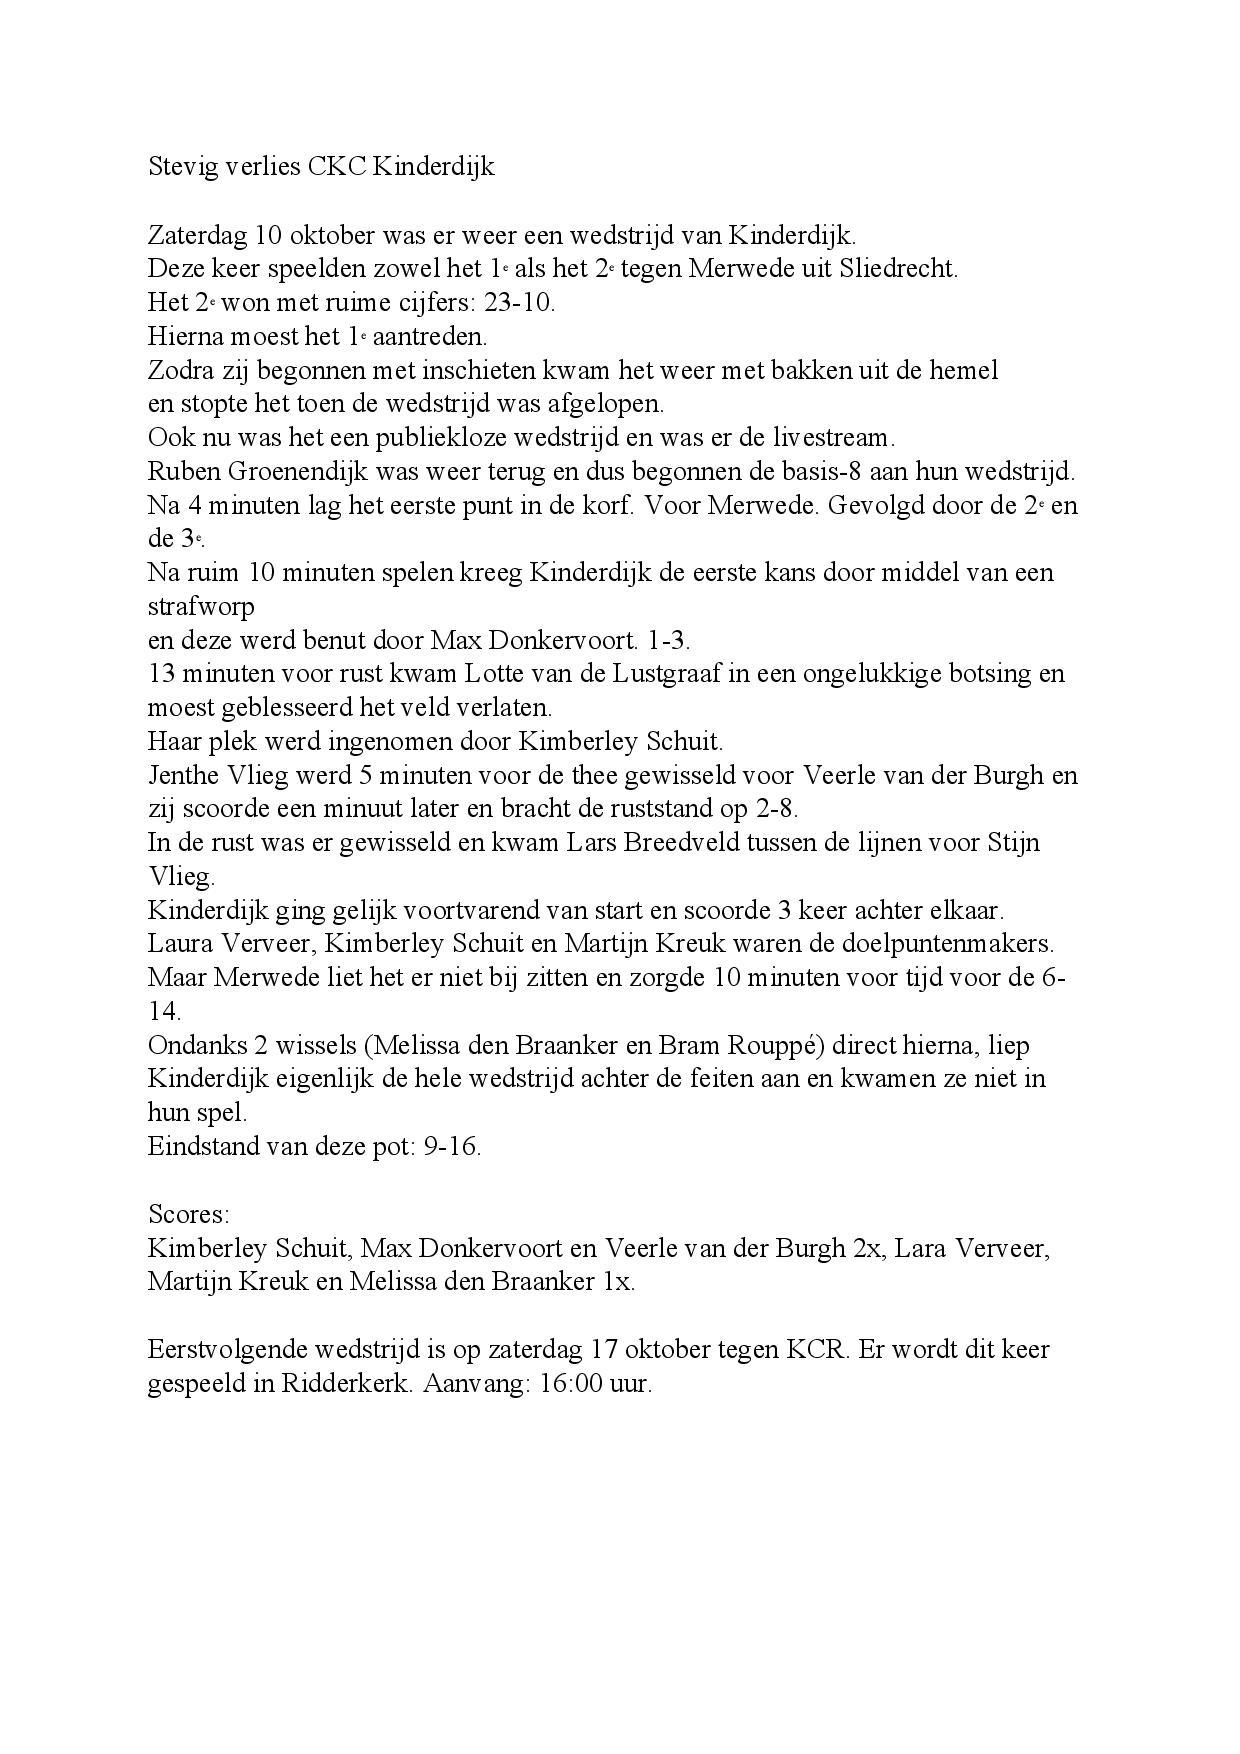 Wedstrijdverslag 10-10-2020 Kinderdijk - Merwede